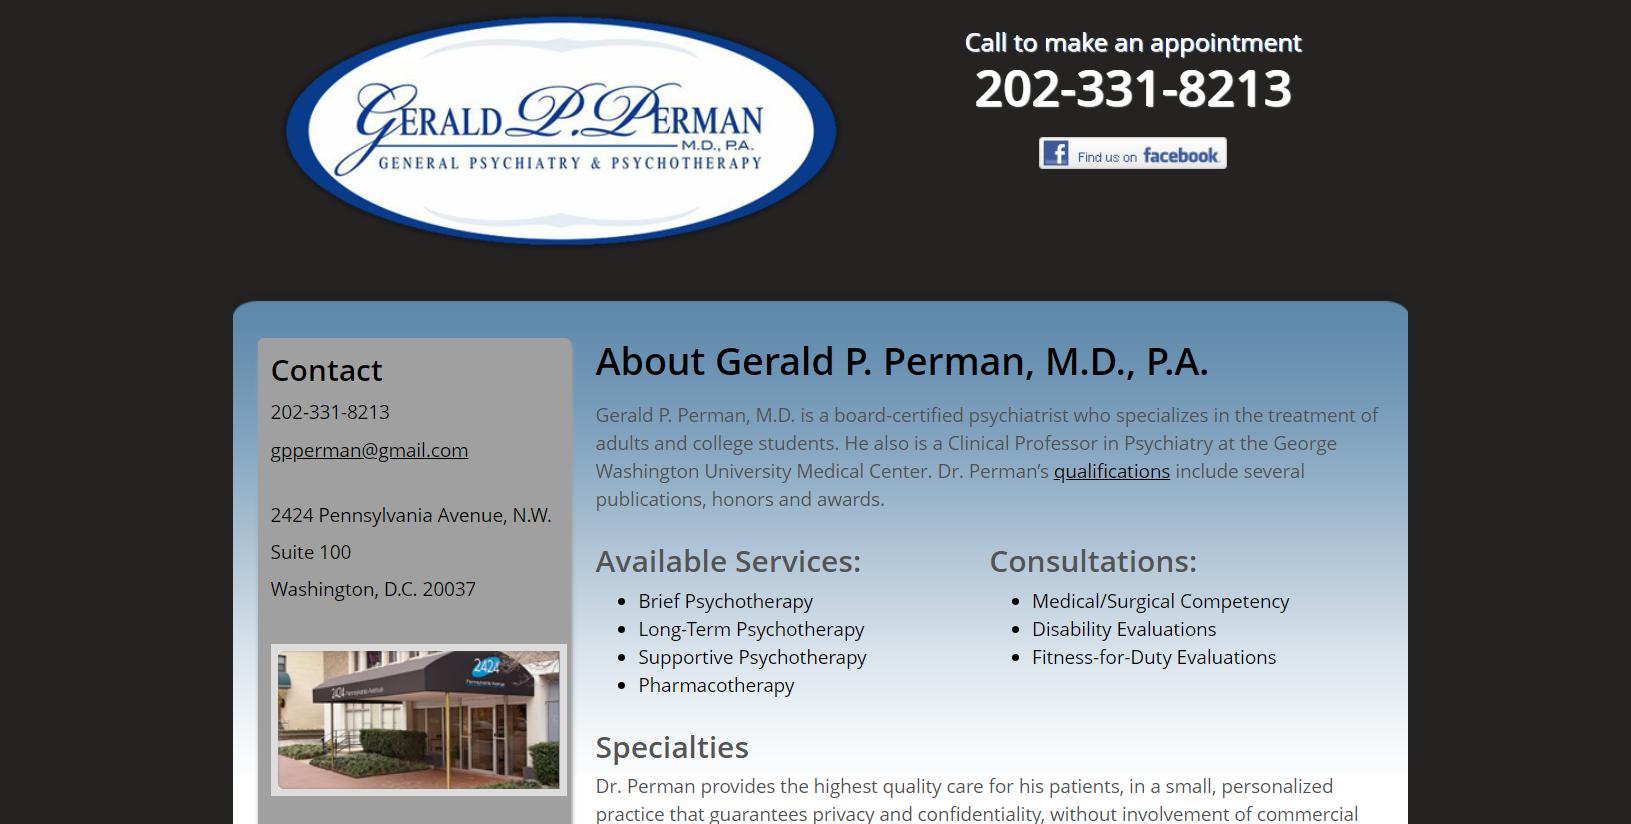 Psychiatrist Gerald Perman in Washington, DC